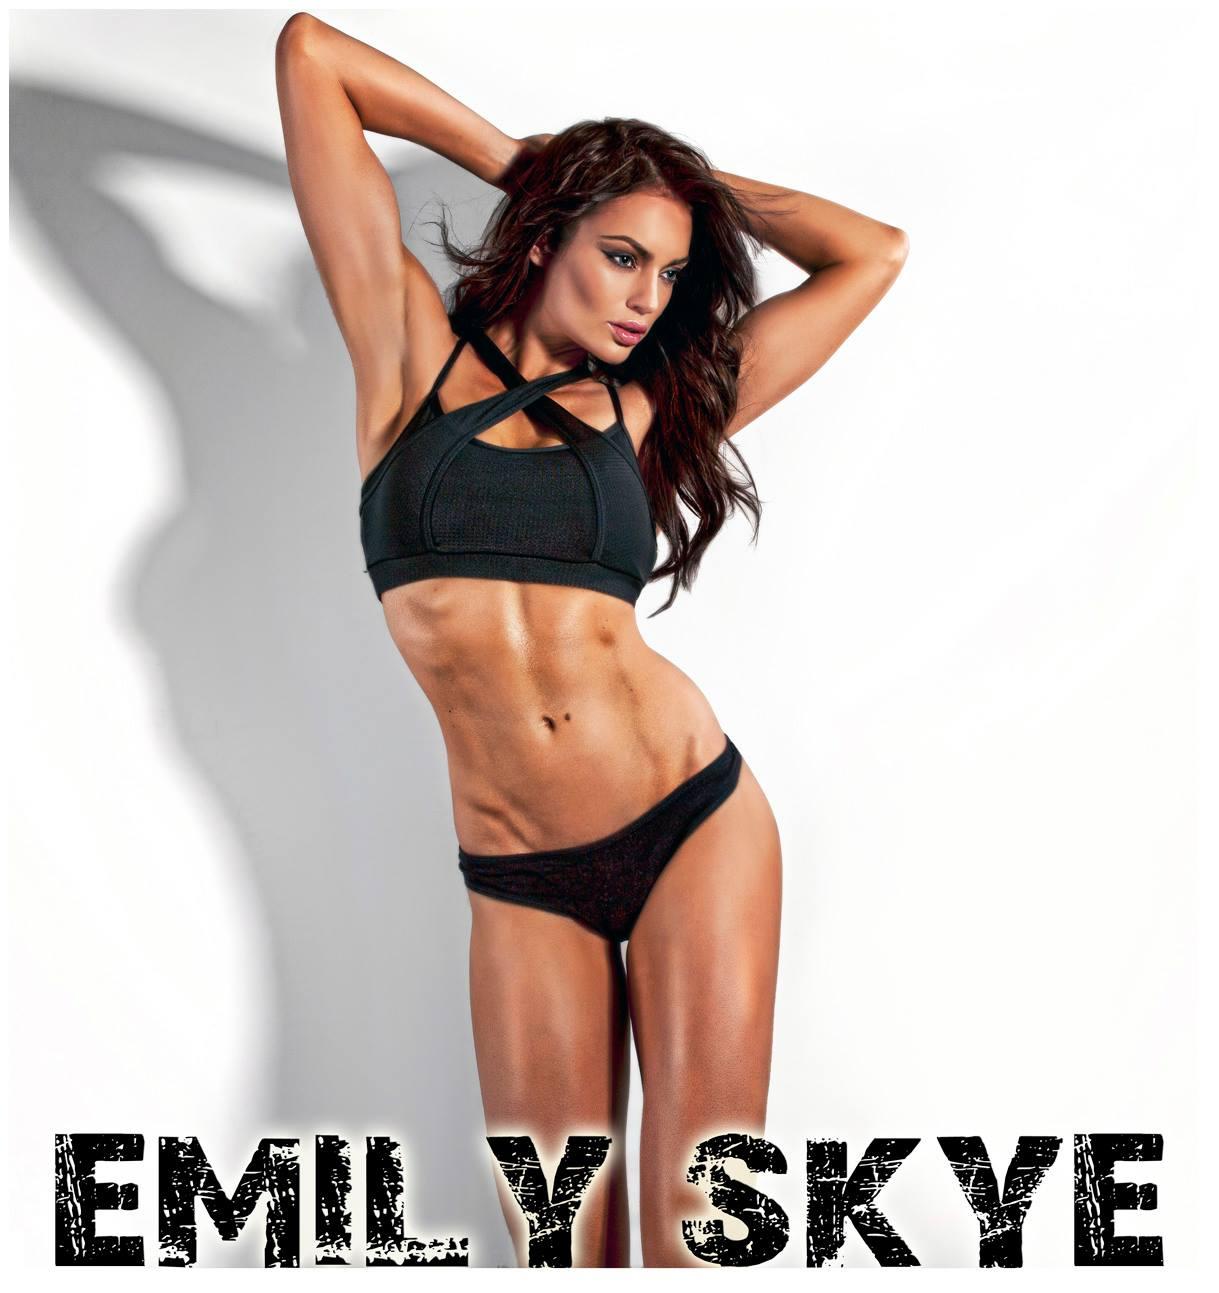 Ana Delia De Iturrondo Nude ana delia de iturrondo diet - ifbb pro bikini athlete ana